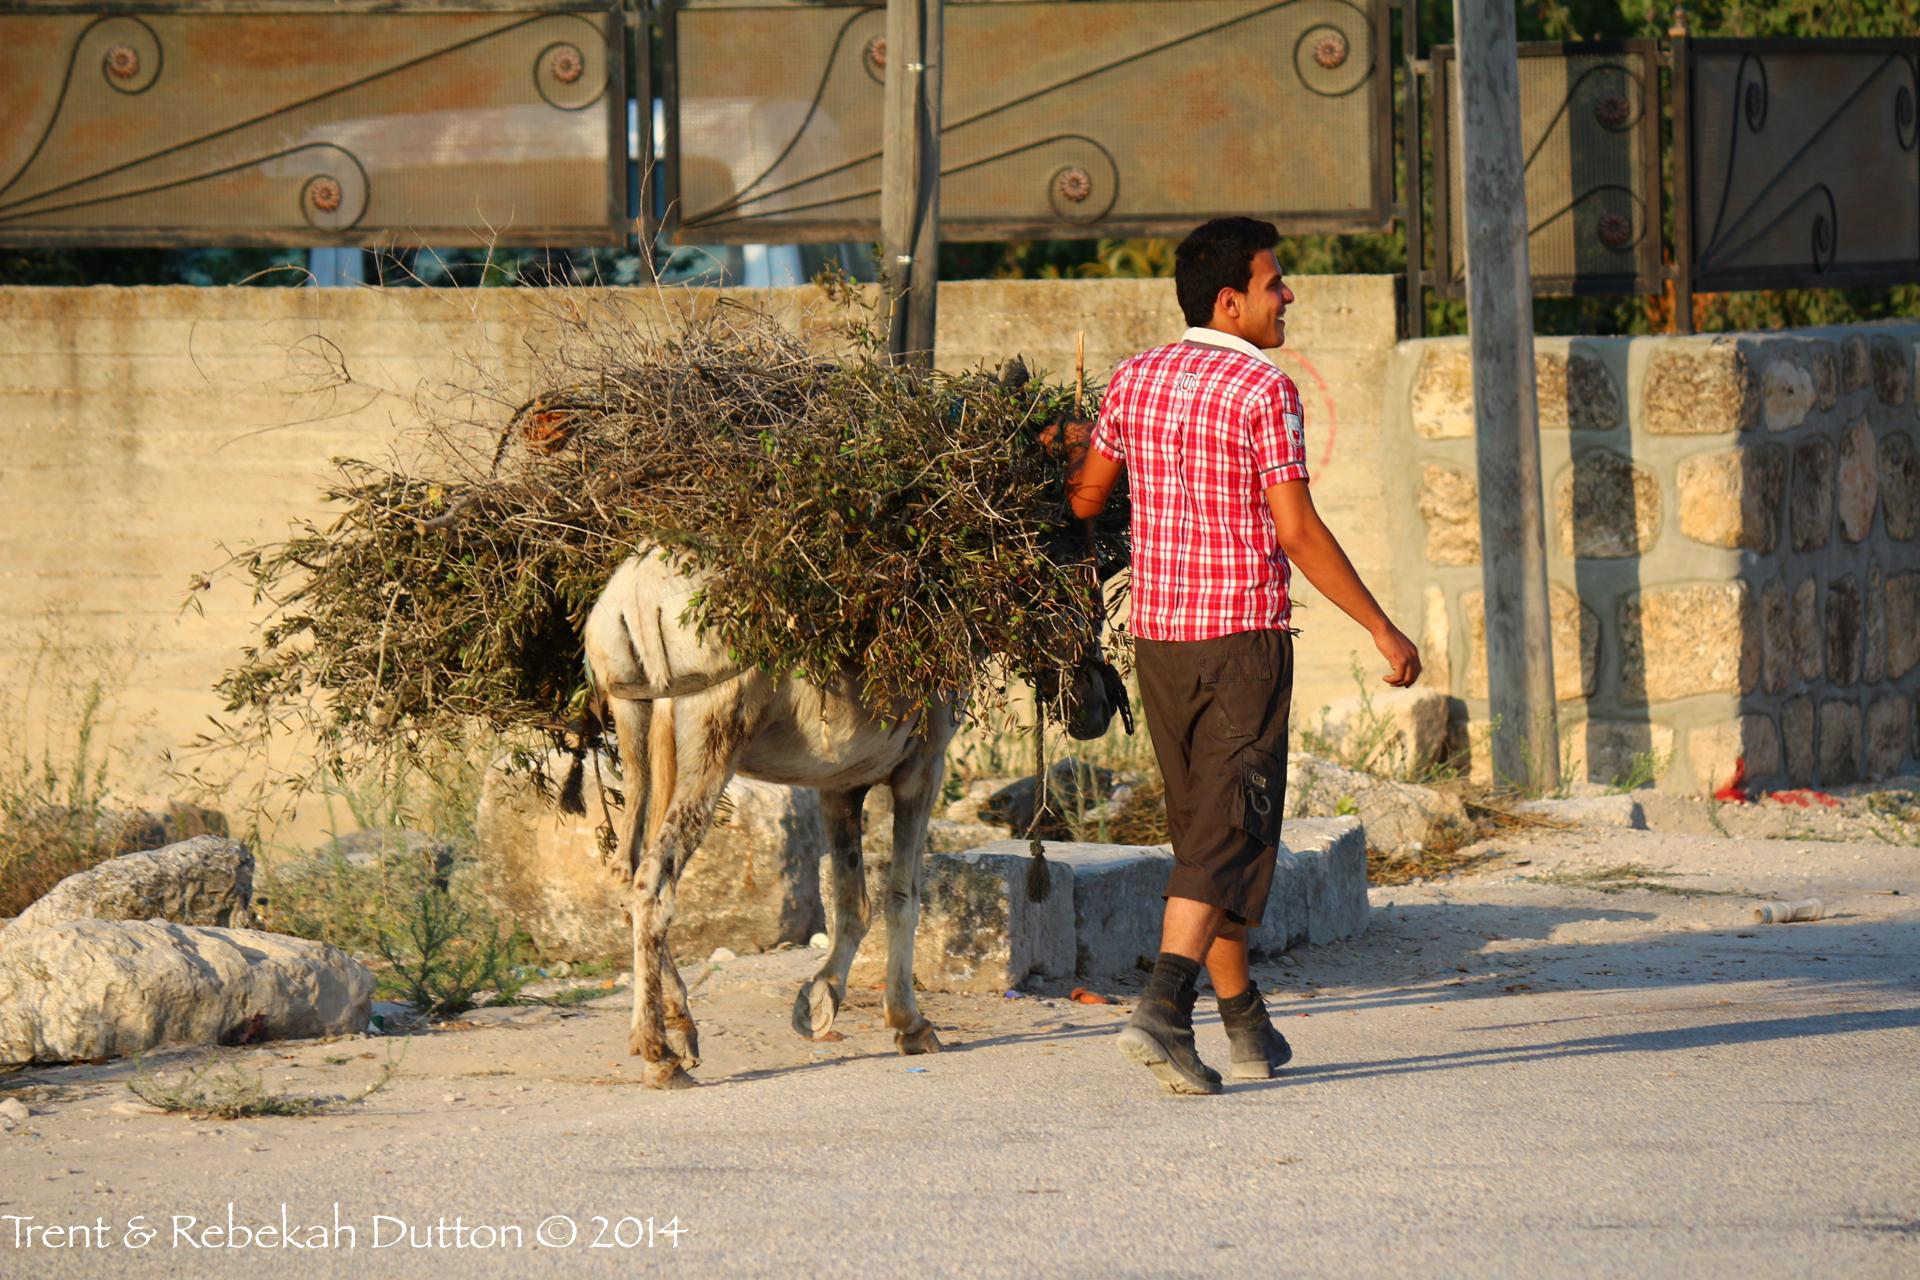 05_Man_w_Donkey_Samaria